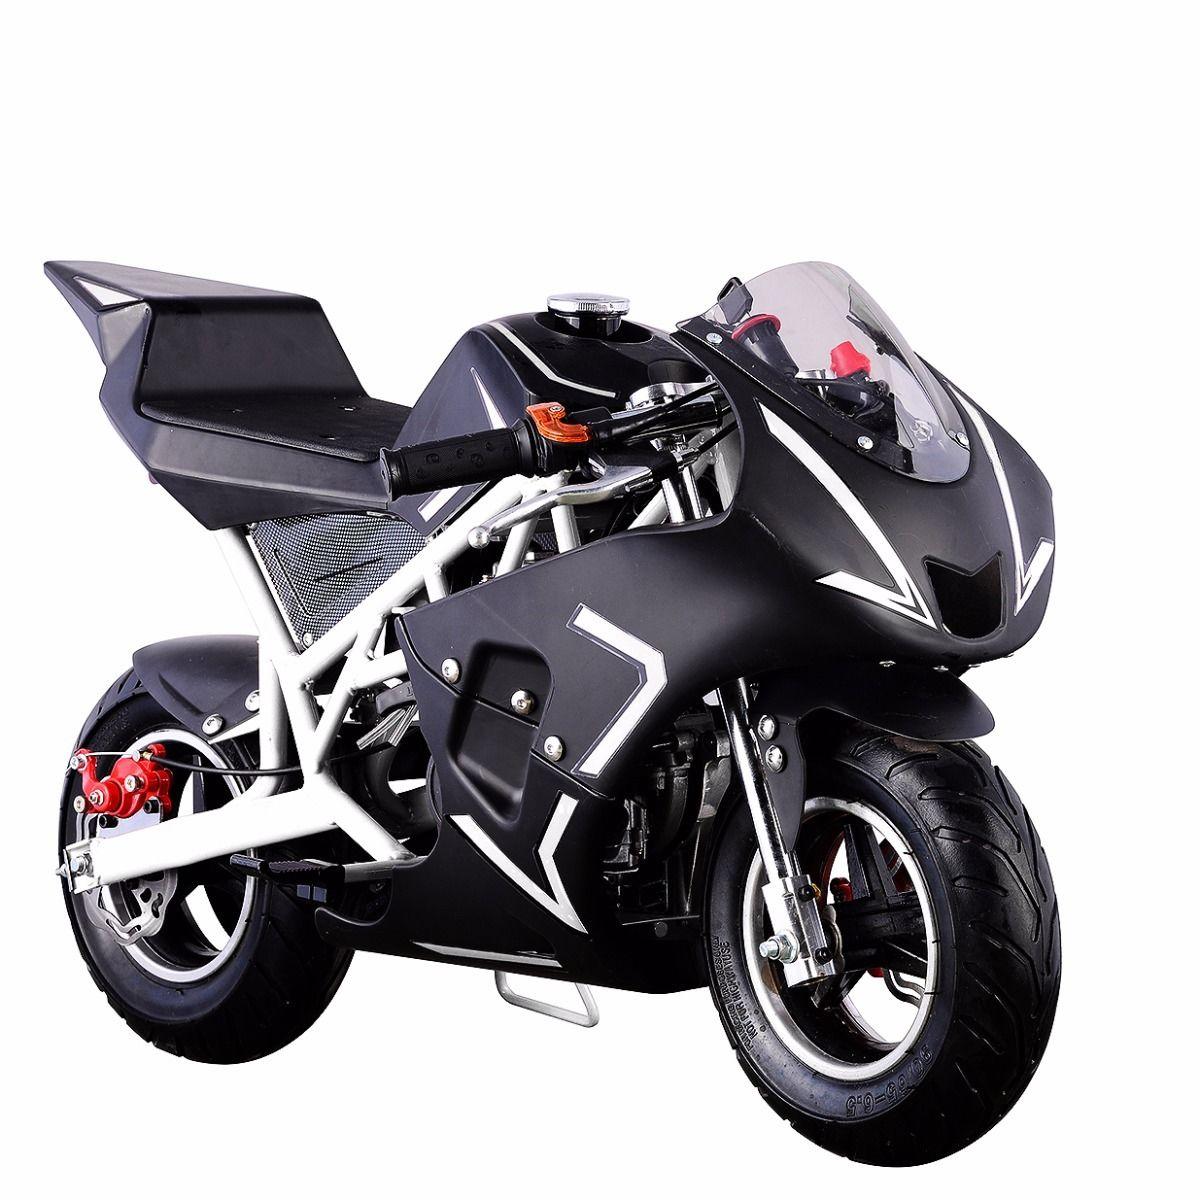 XtremepowerUS-Gas-Pocket-Bike-Motor-Bike-Scooter-40cc-Epa-Engine-Motorcycle thumbnail 30